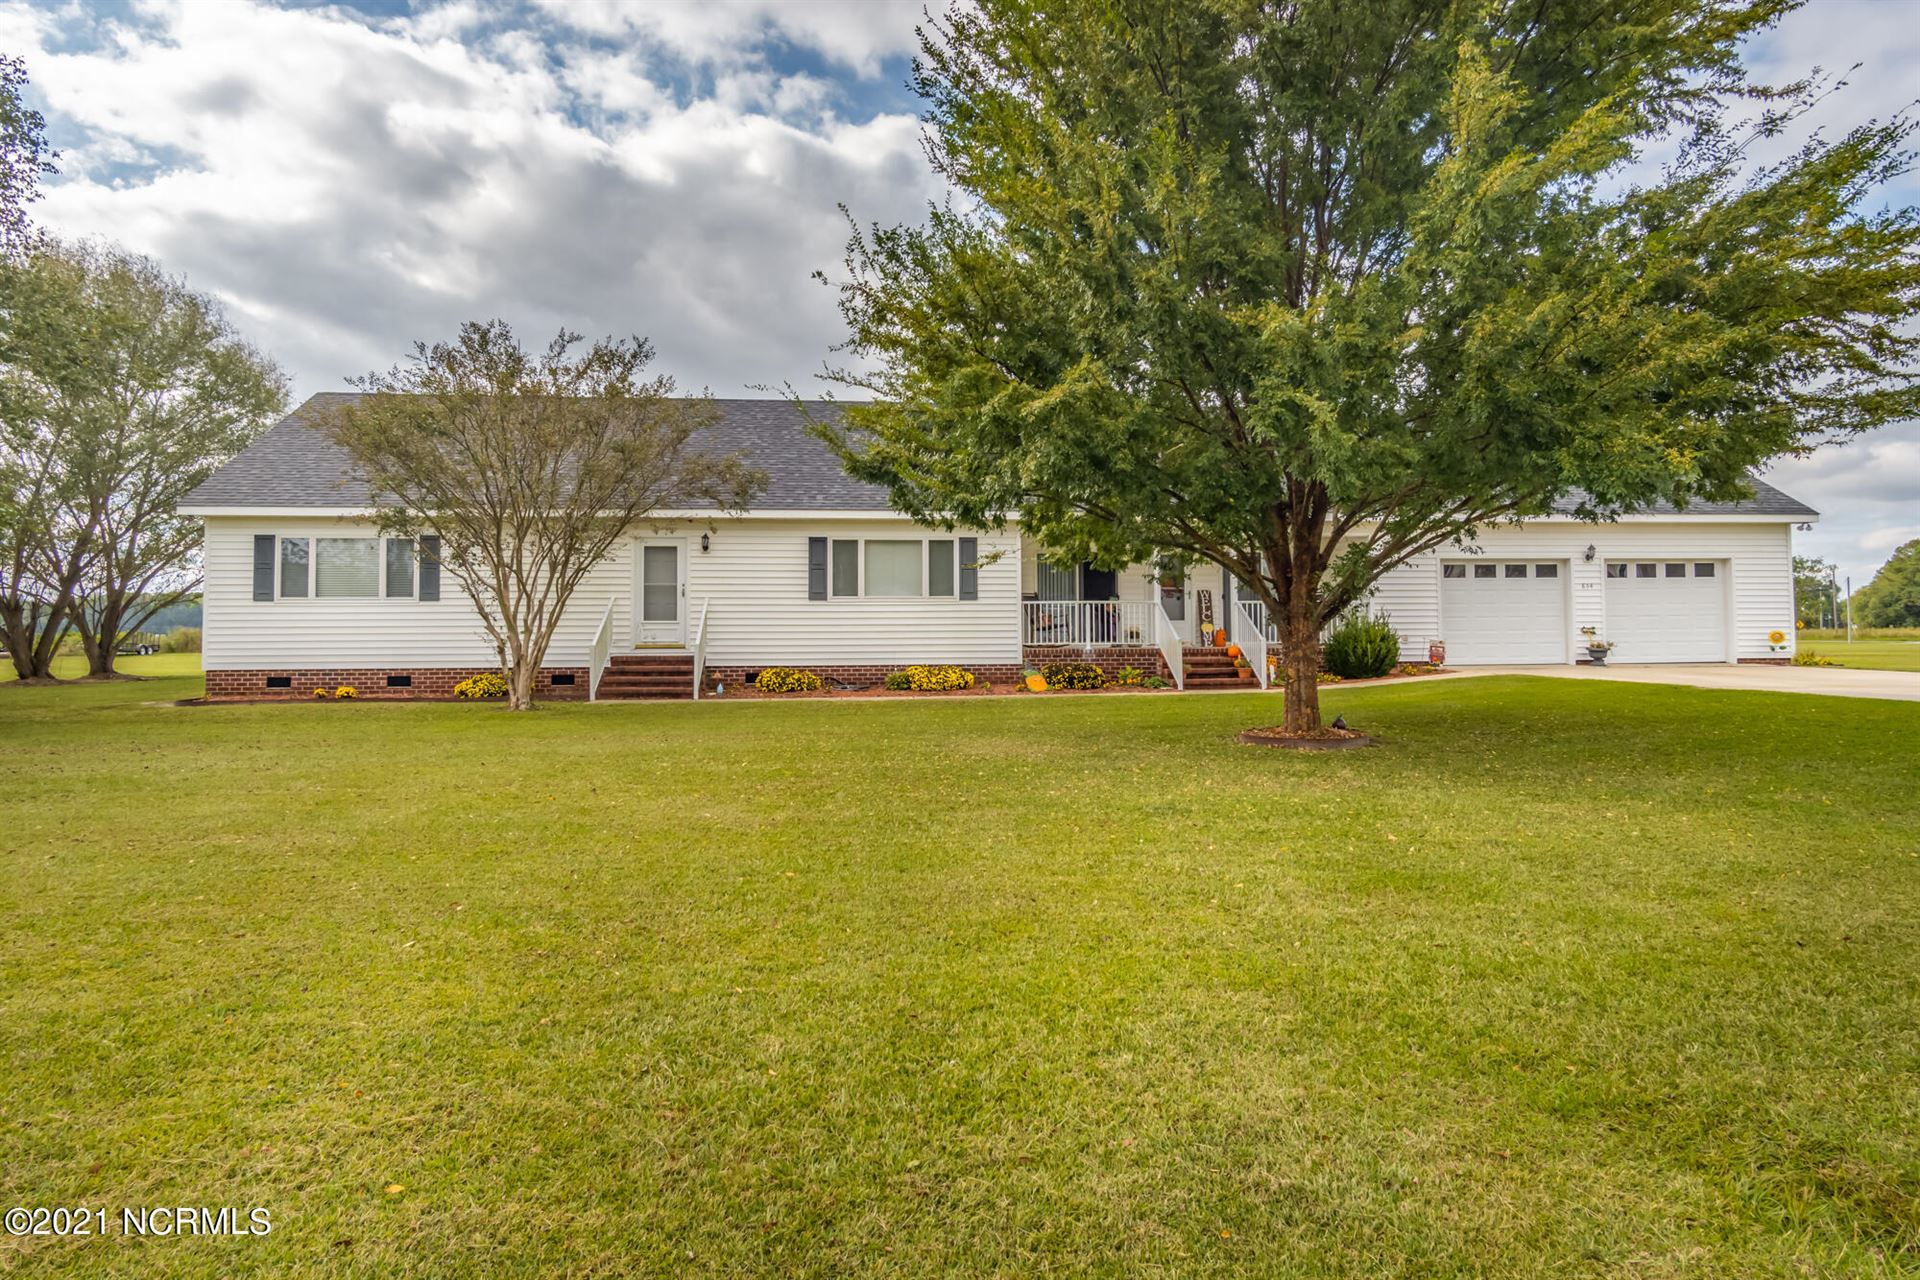 Photo of 834 Chase Drive, Kinston, NC 28504 (MLS # 100293881)